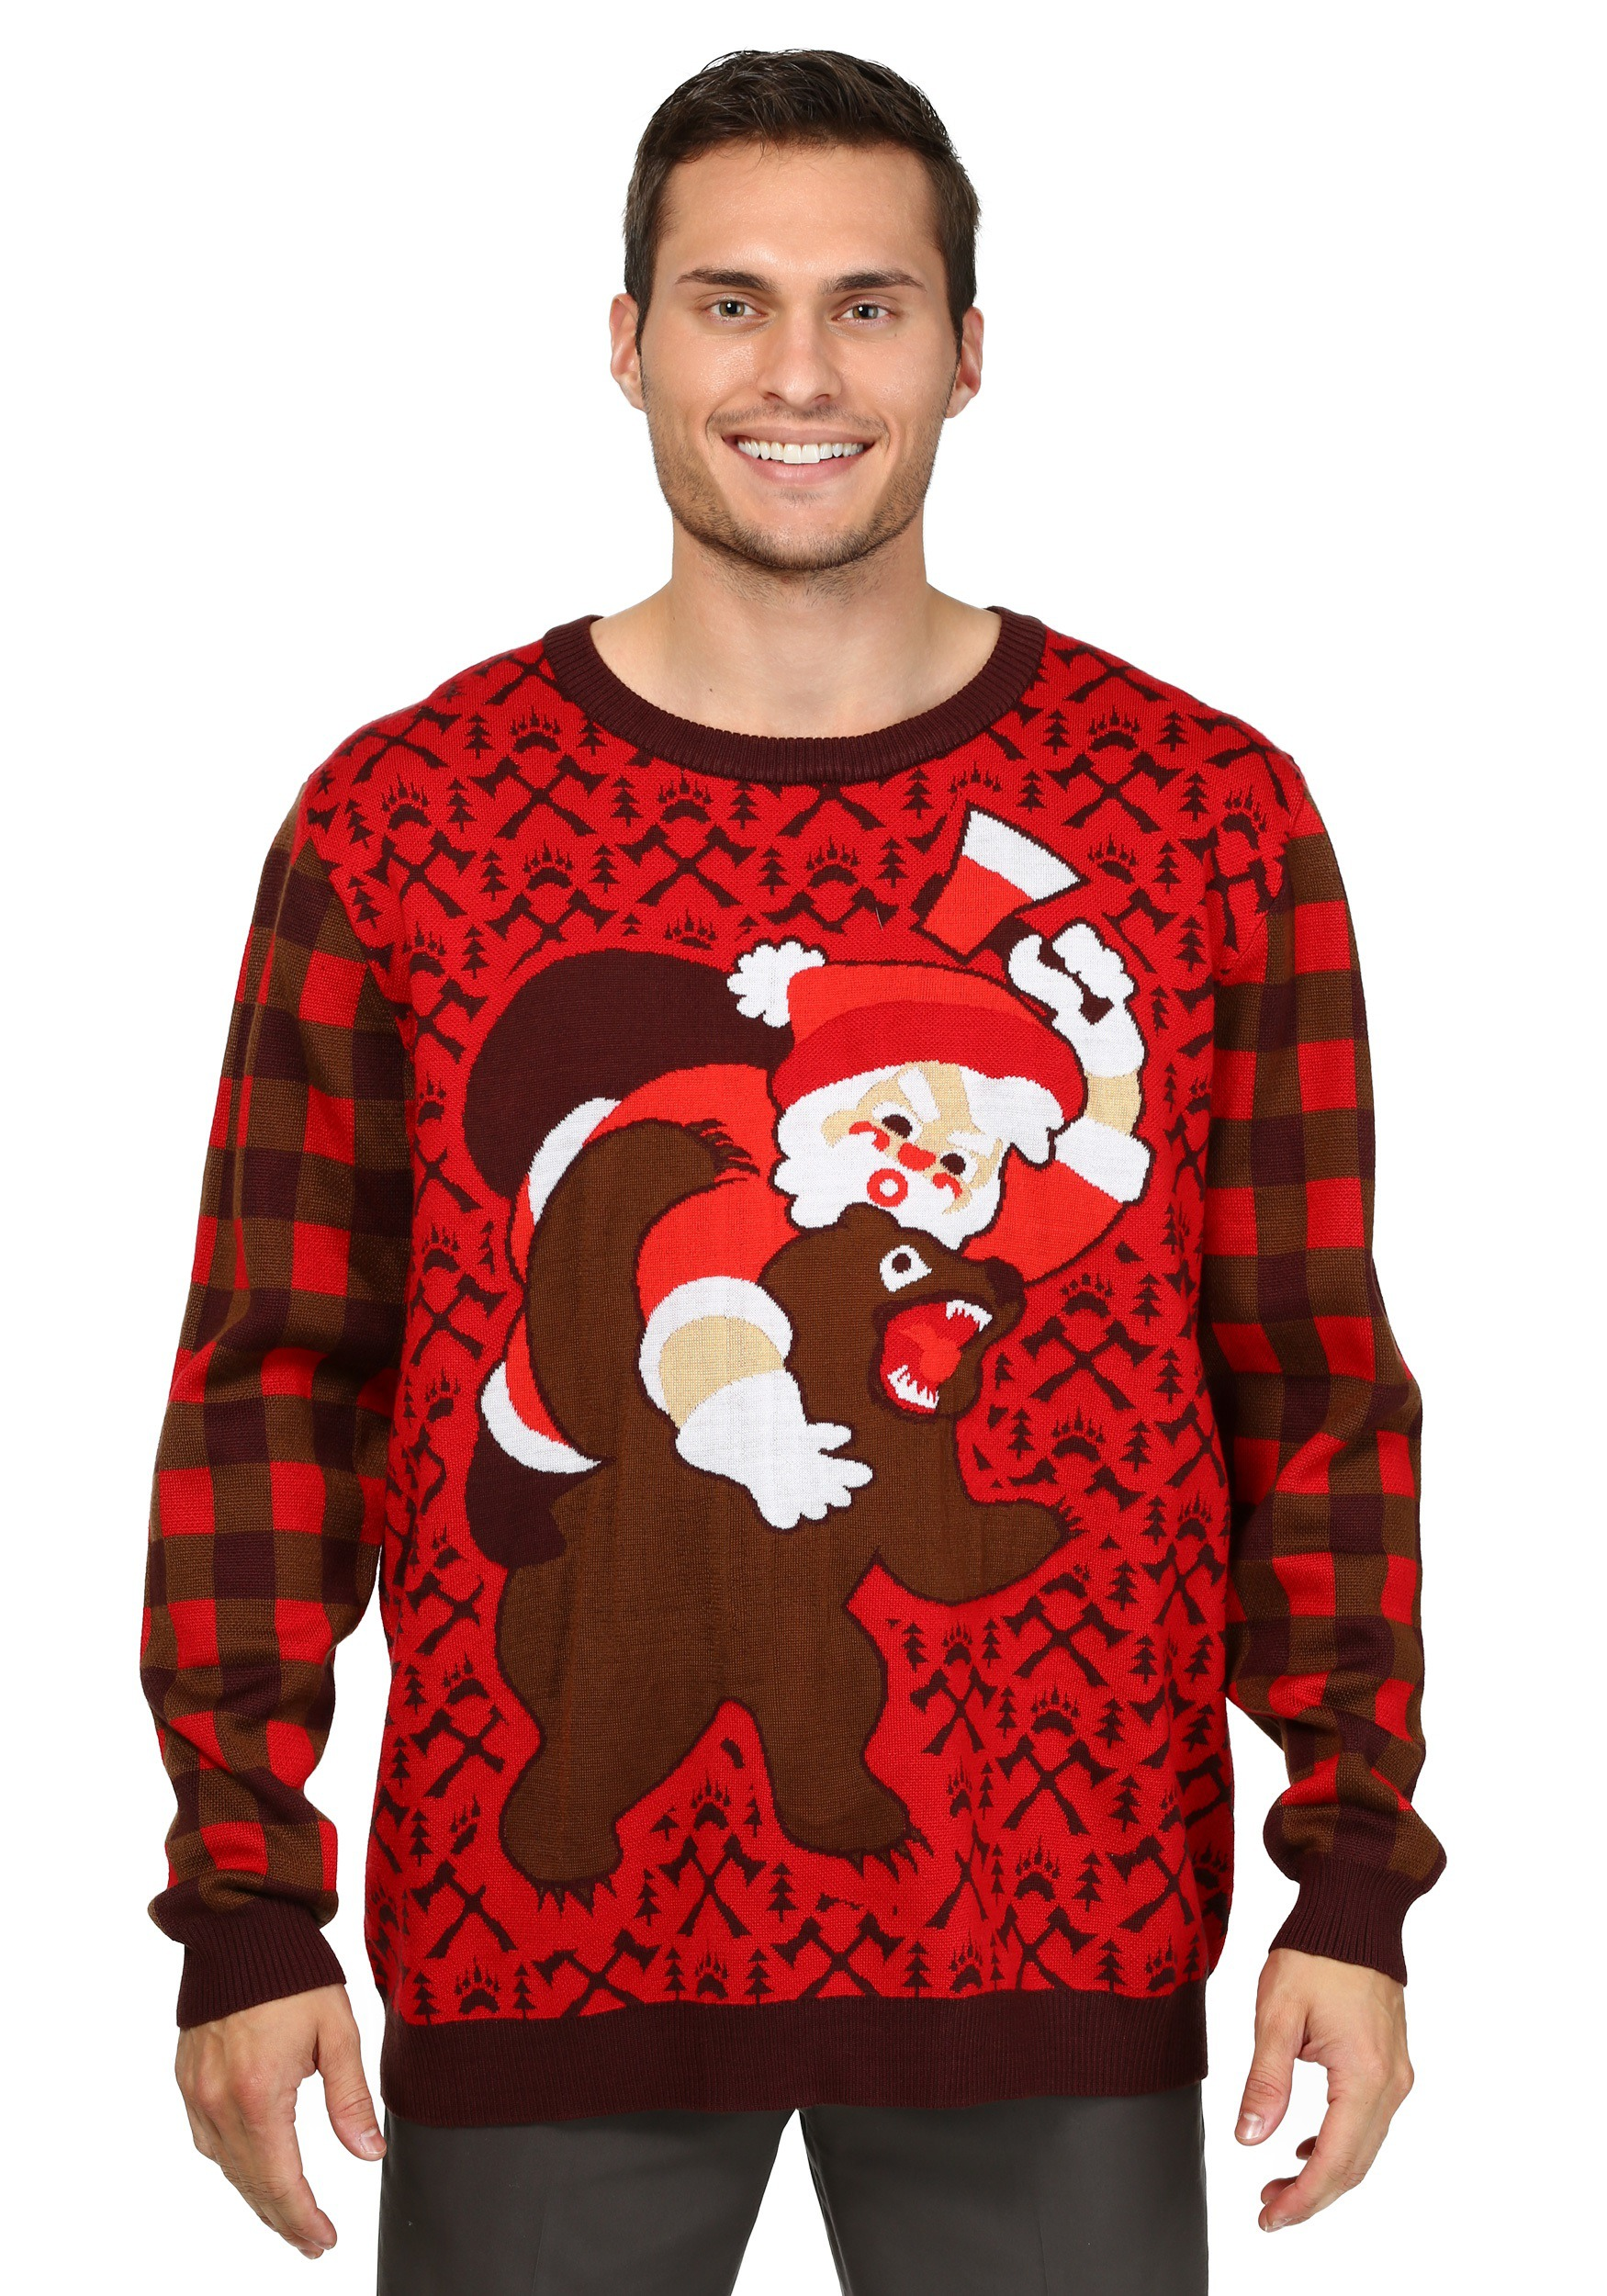 Christmas Sweater.Santa Vs Bear Ugly Christmas Sweater